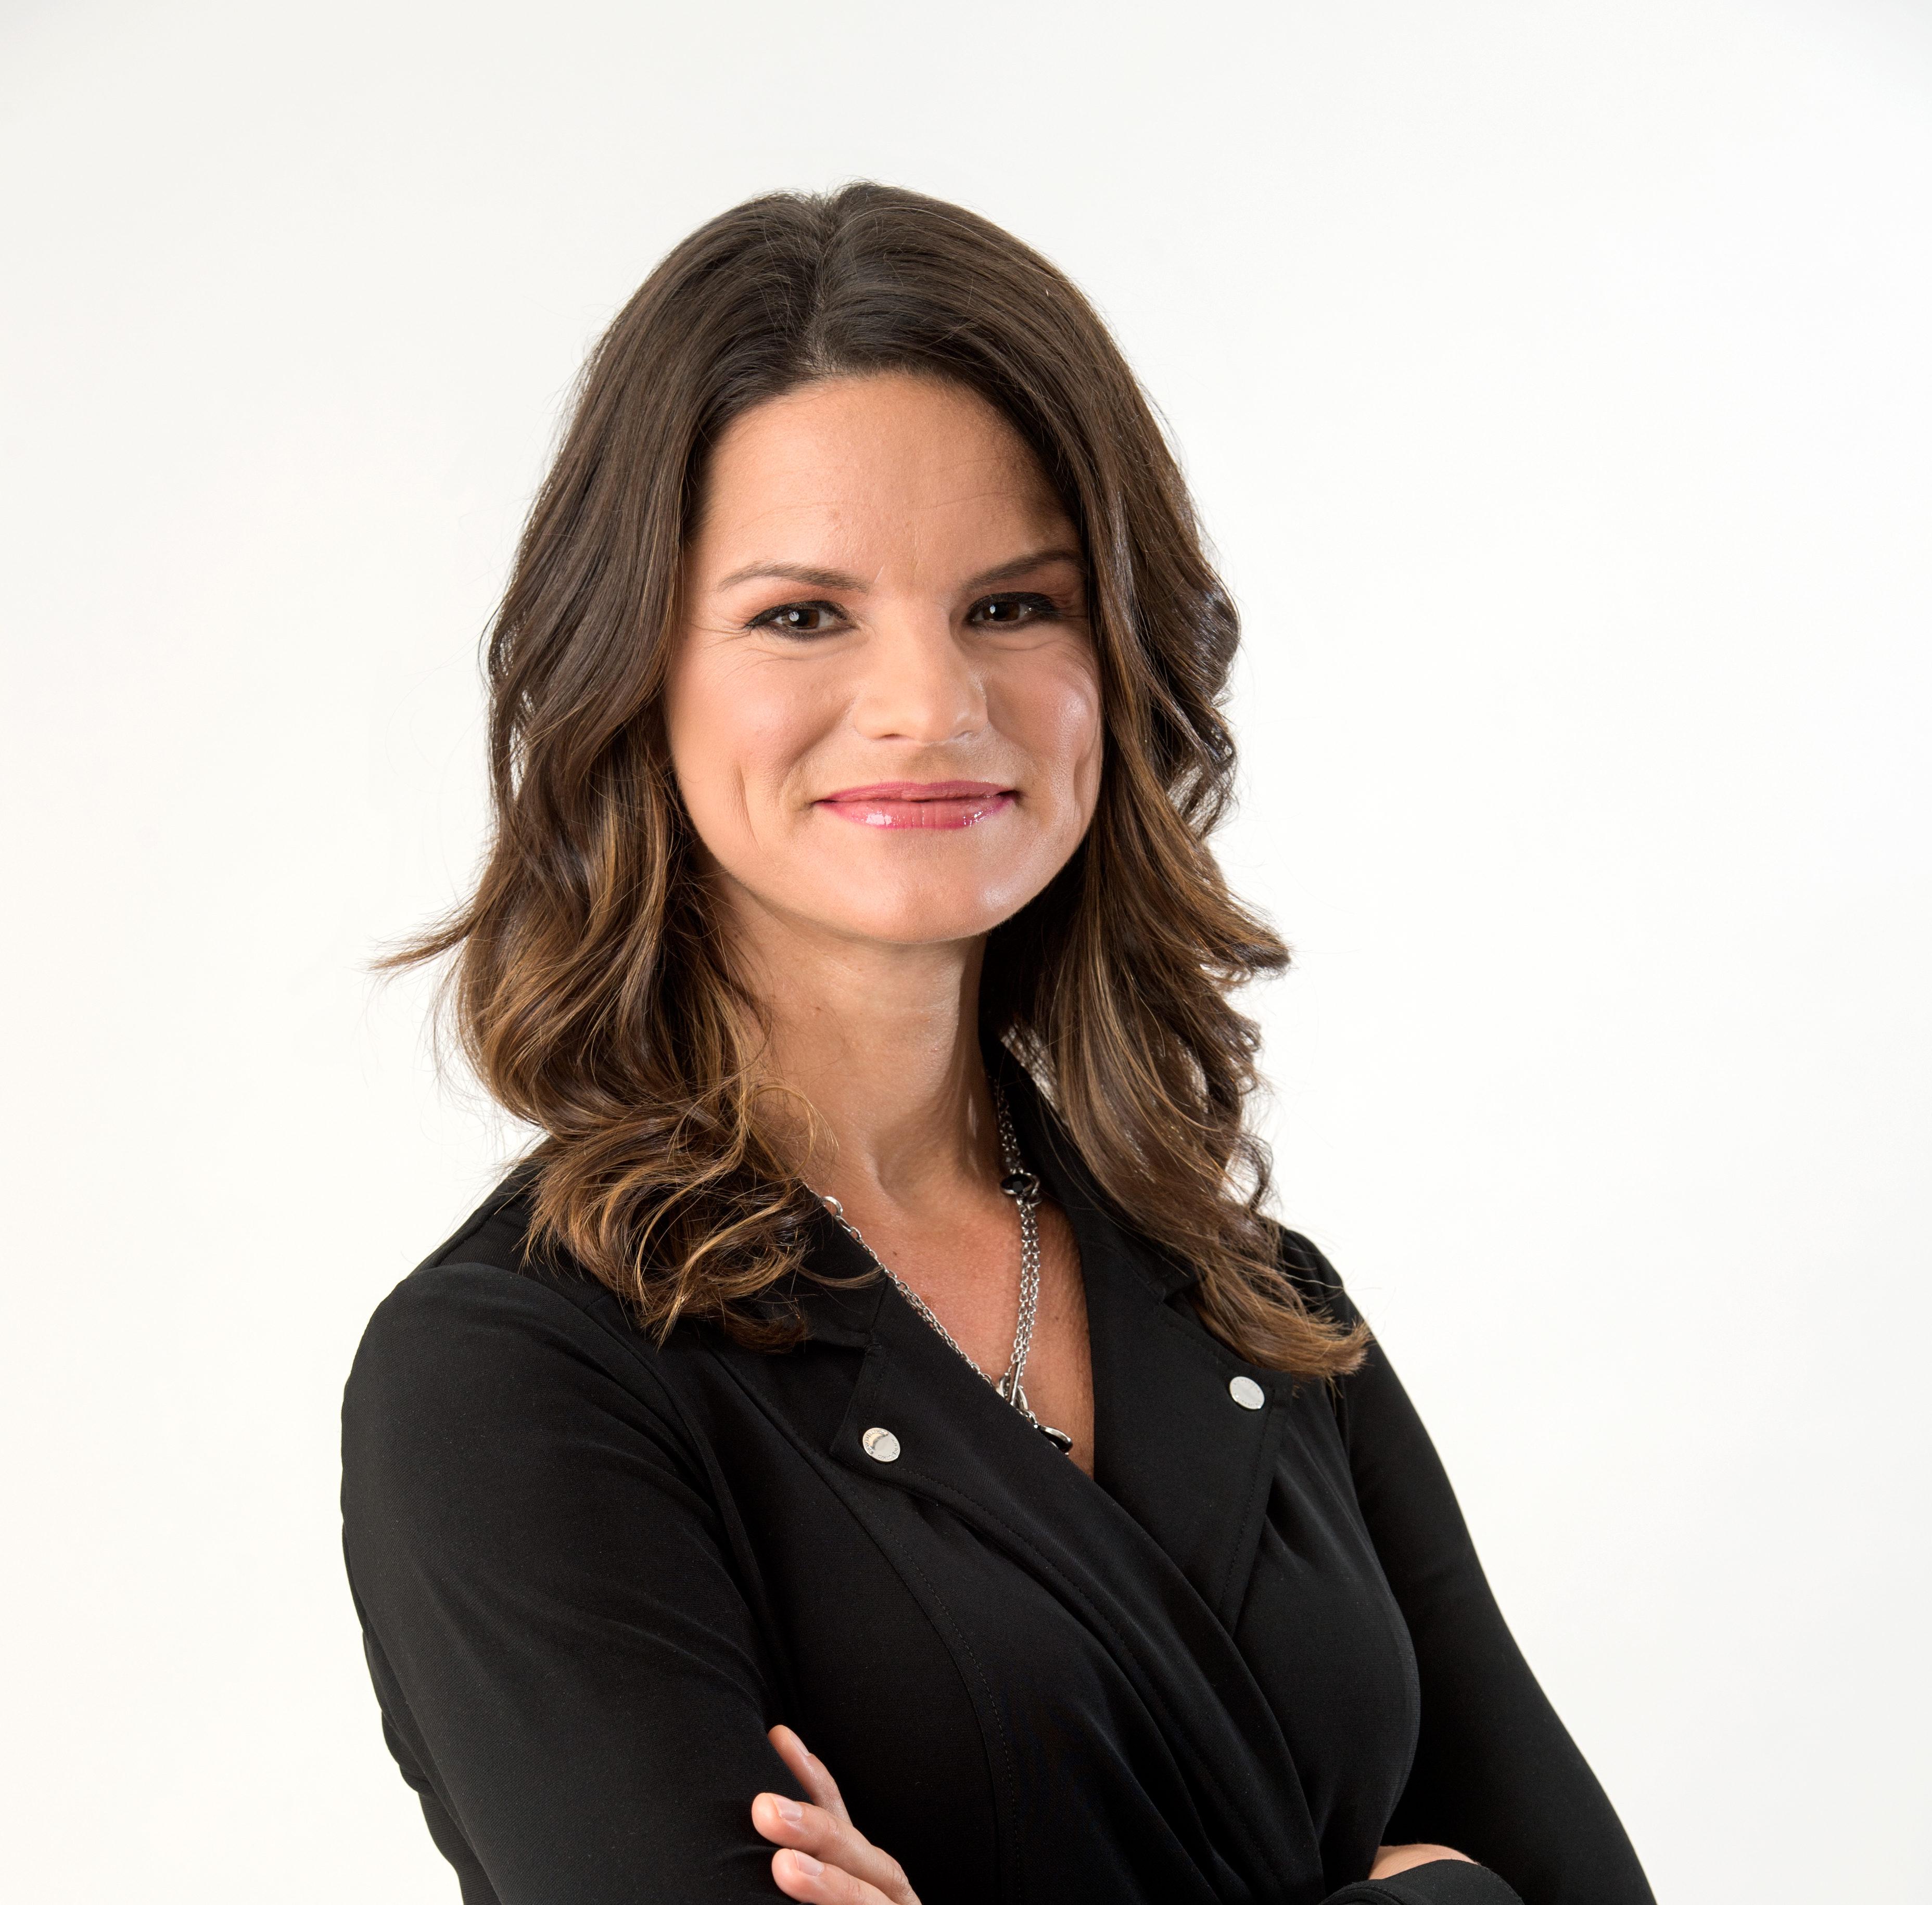 Heather Dinich - ESPN Press Room U S